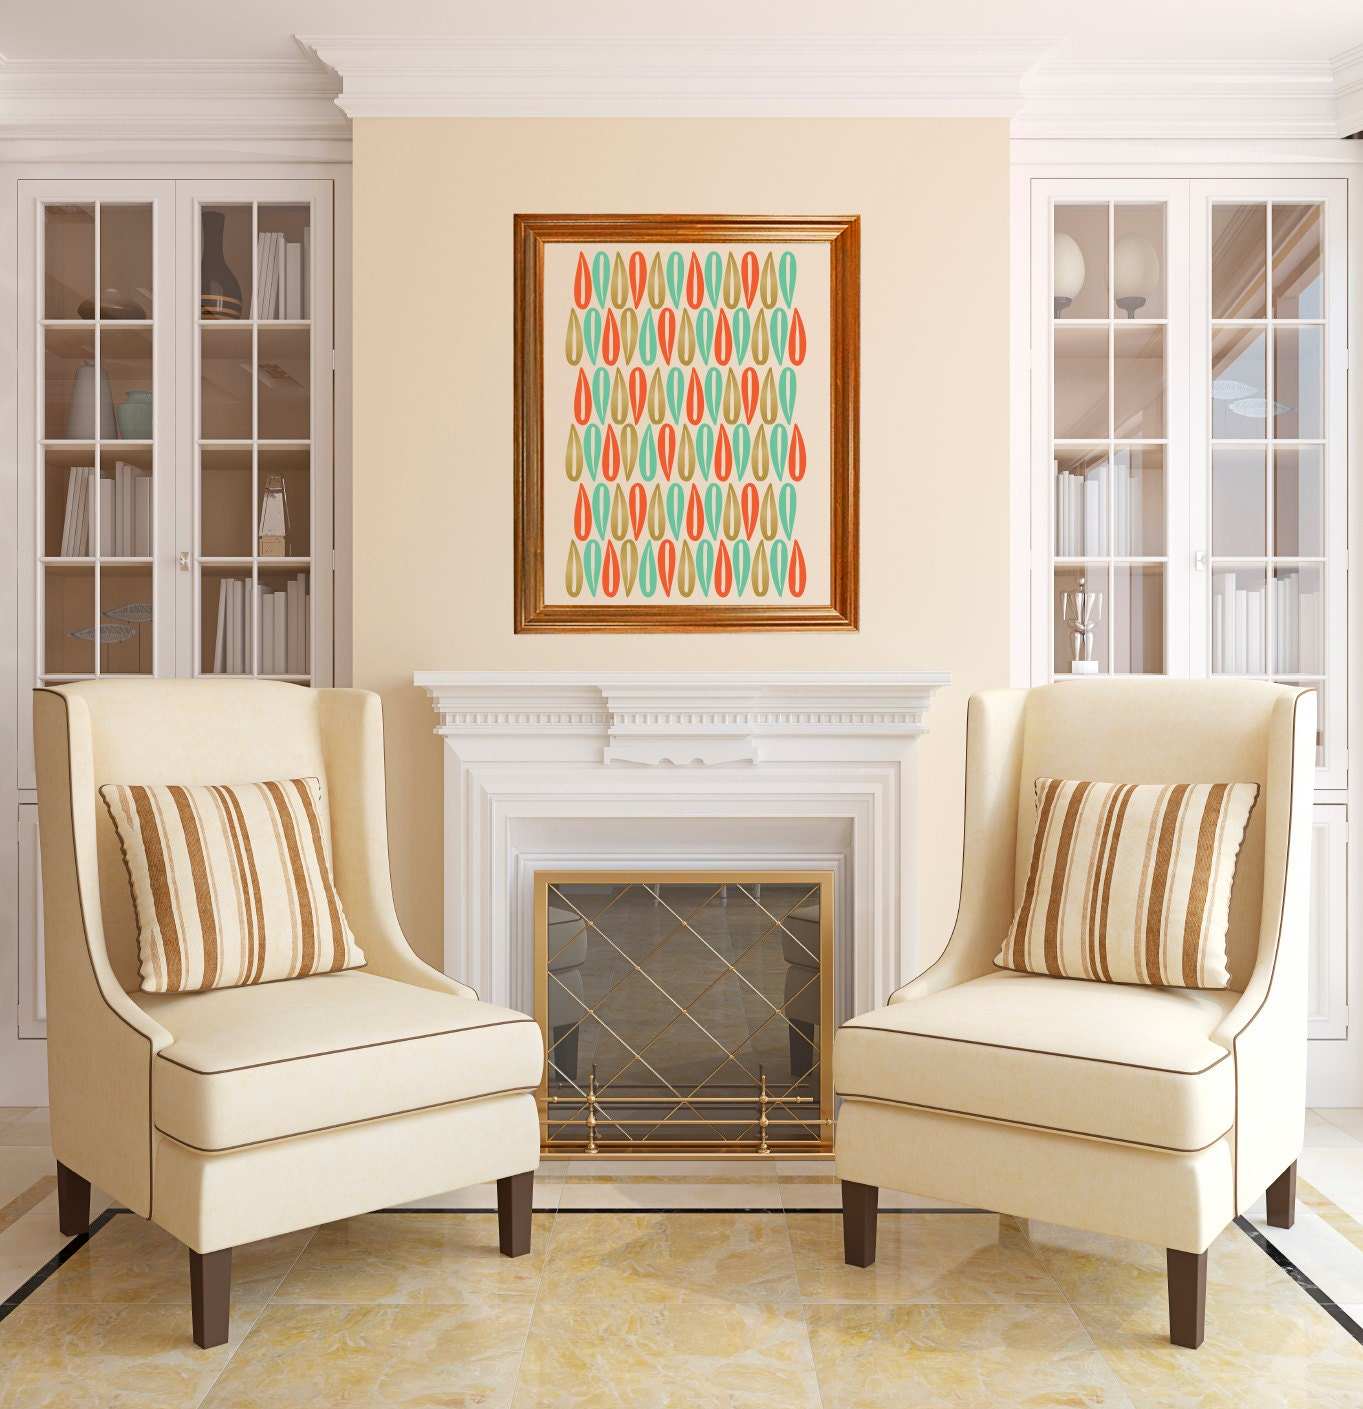 items similar to mid century modern art mod petals wall. Black Bedroom Furniture Sets. Home Design Ideas